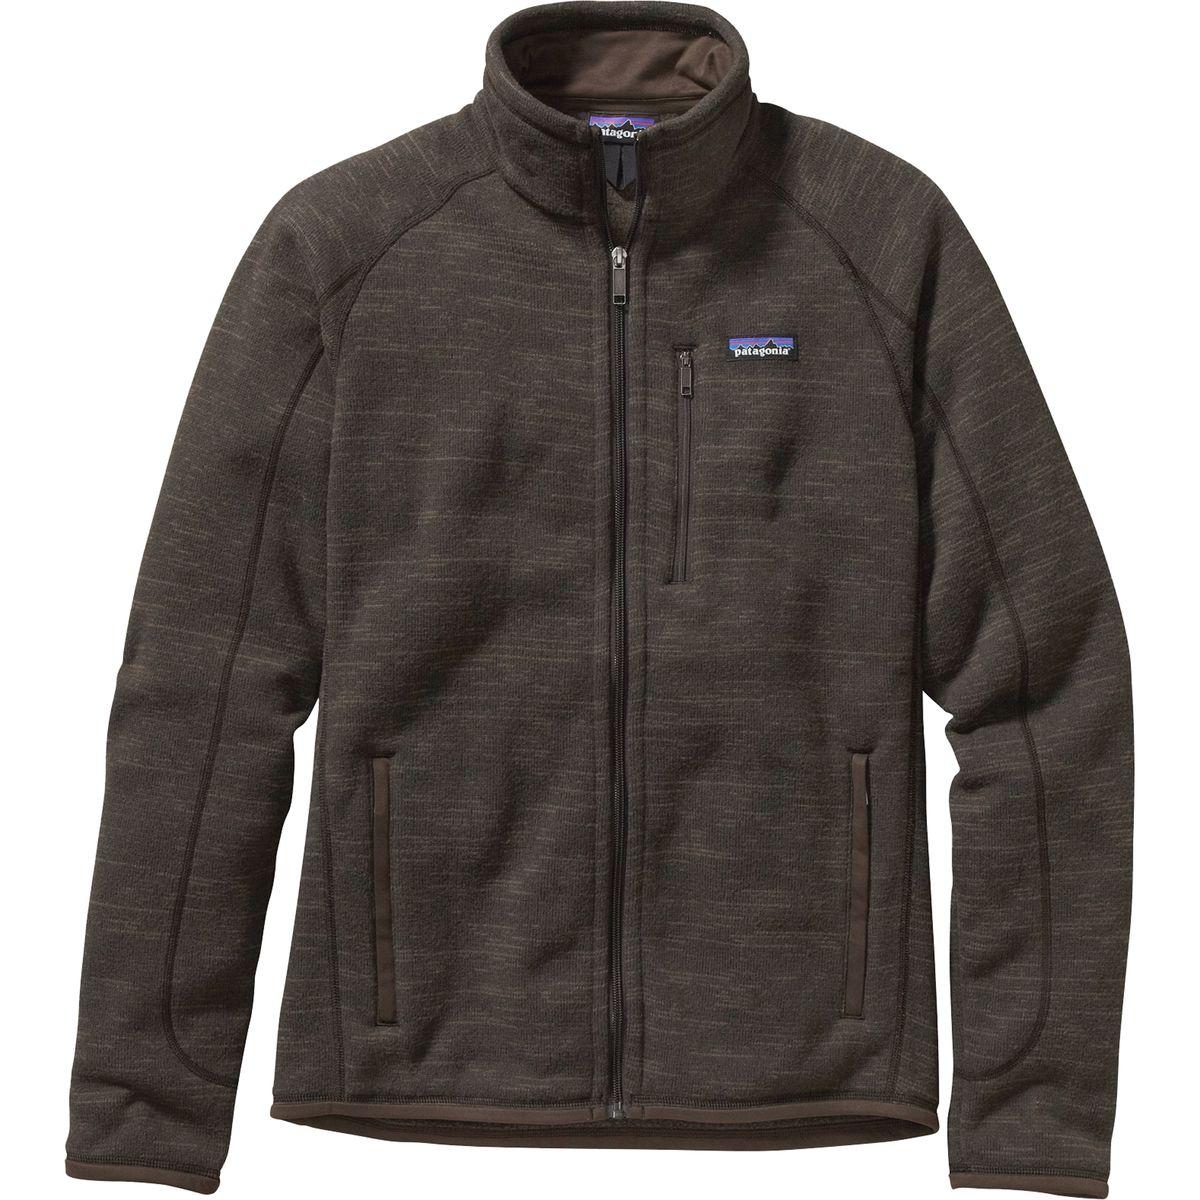 Patagonia Better Sweater Fleece Jacket - Men